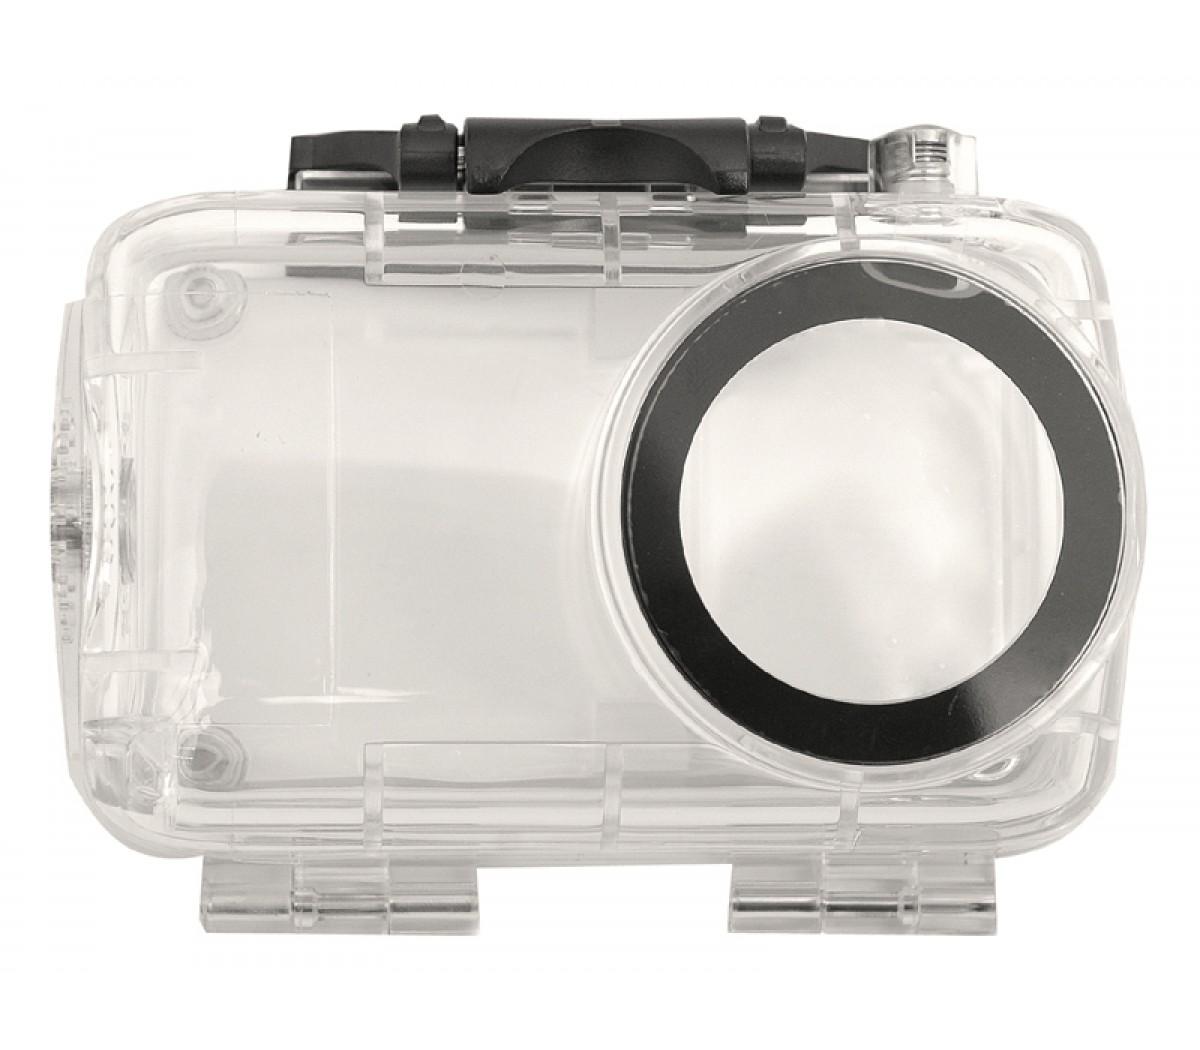 Waterdichte behuizing voor de Abus Sportscam camera